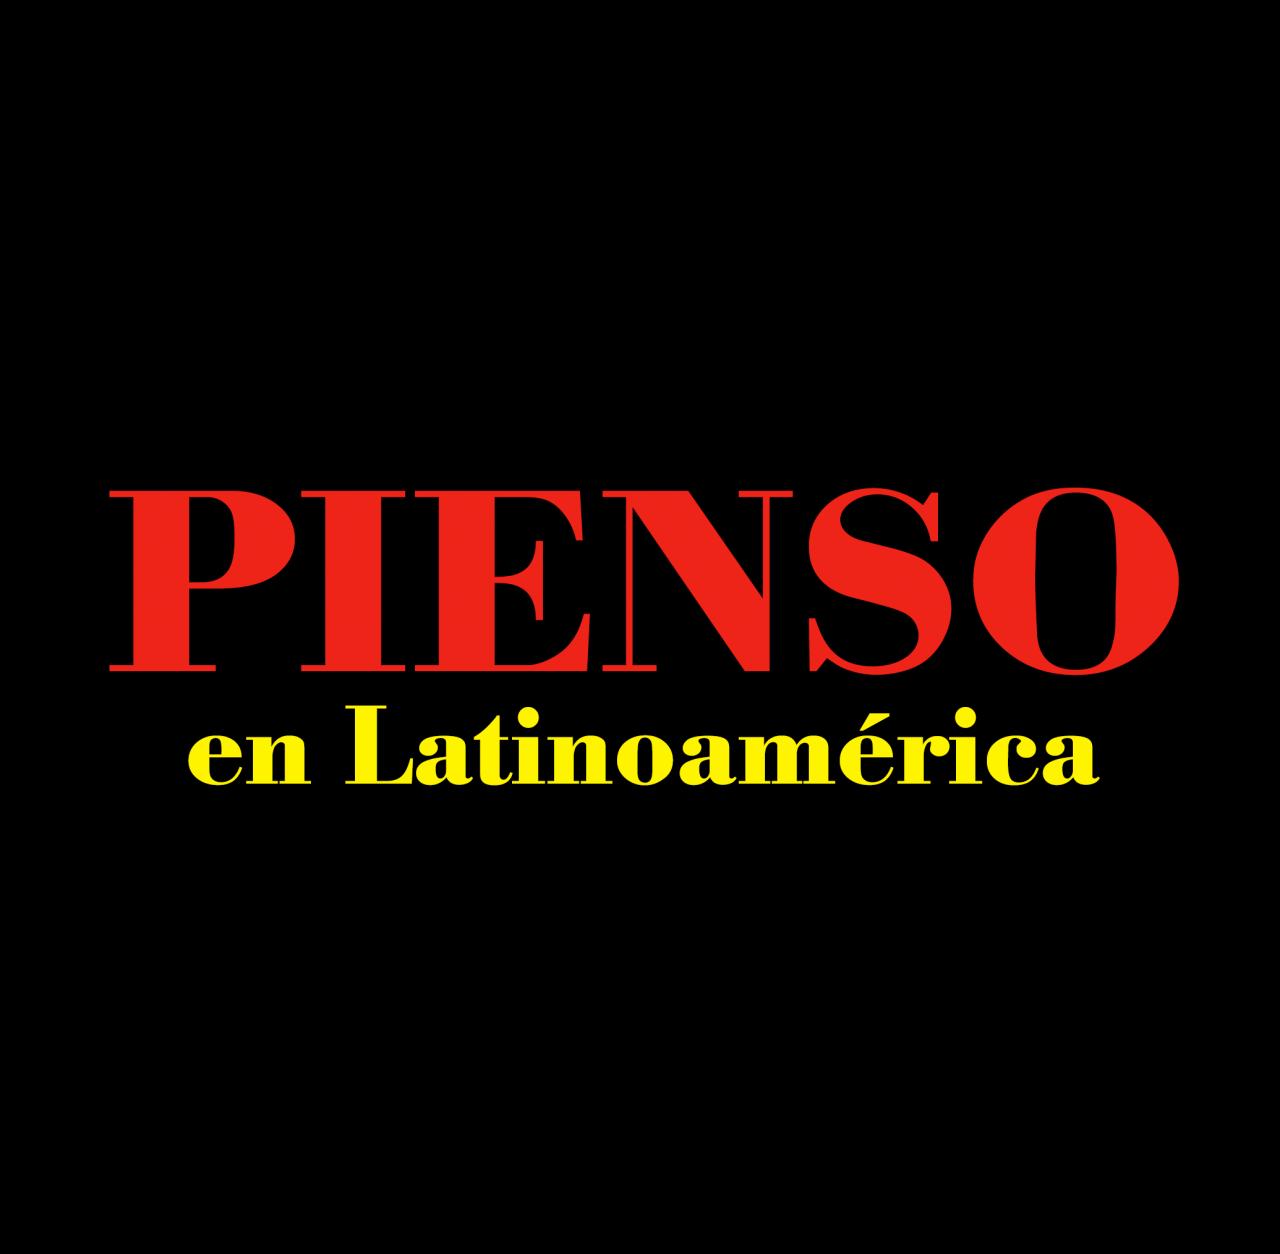 Pienso en latinoamerica